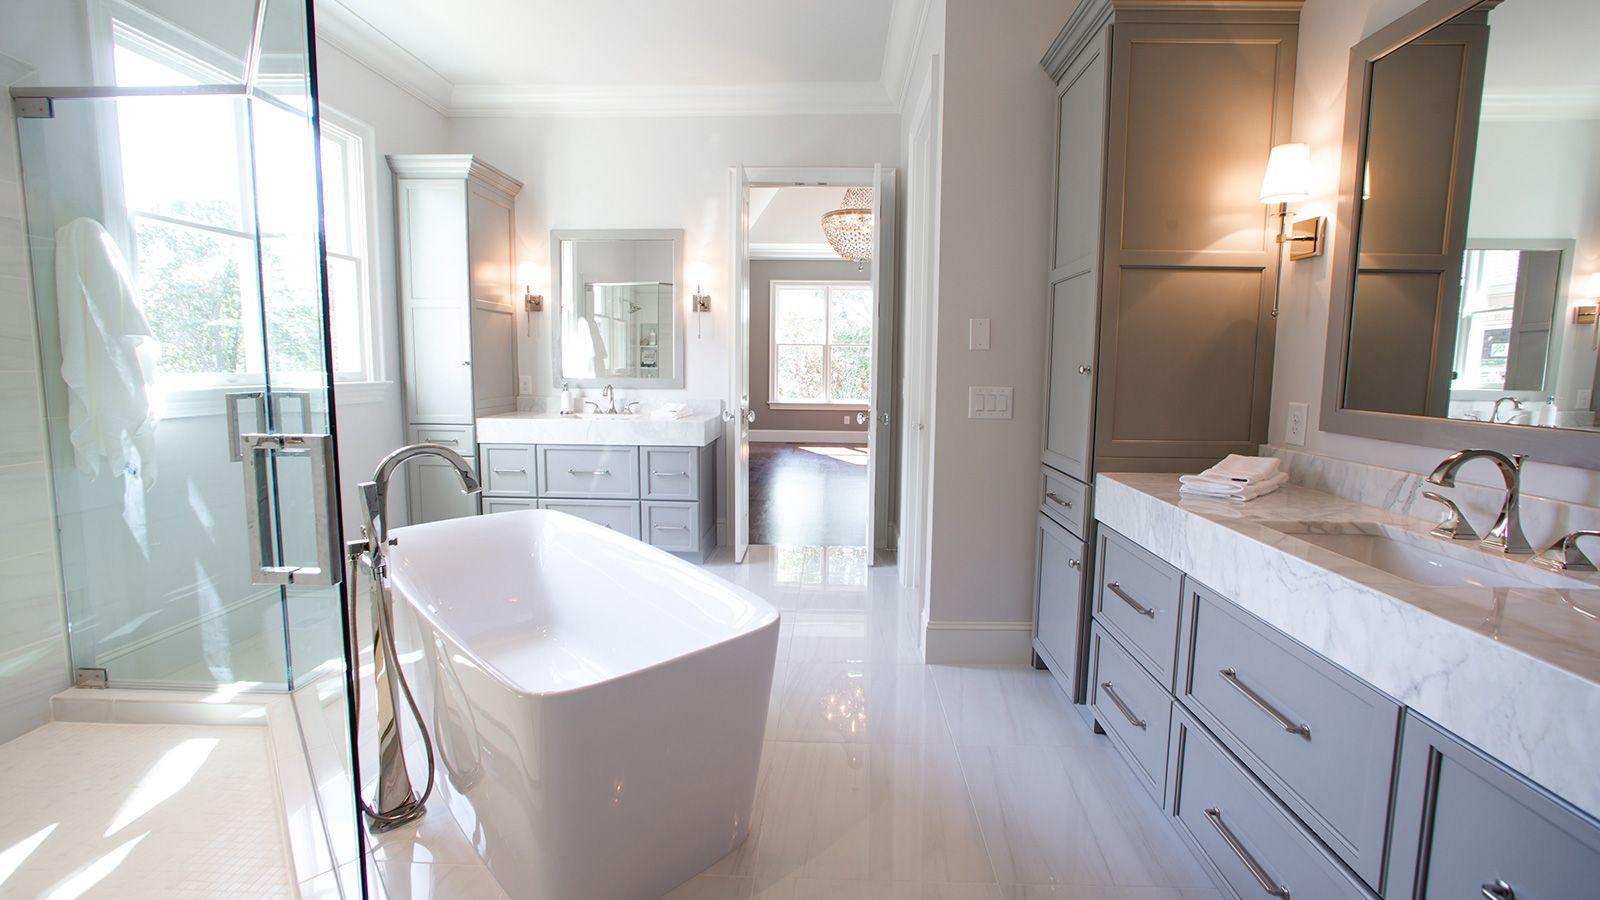 Home Bathroom Tile | Bathroom Tile Stores Near Me ...